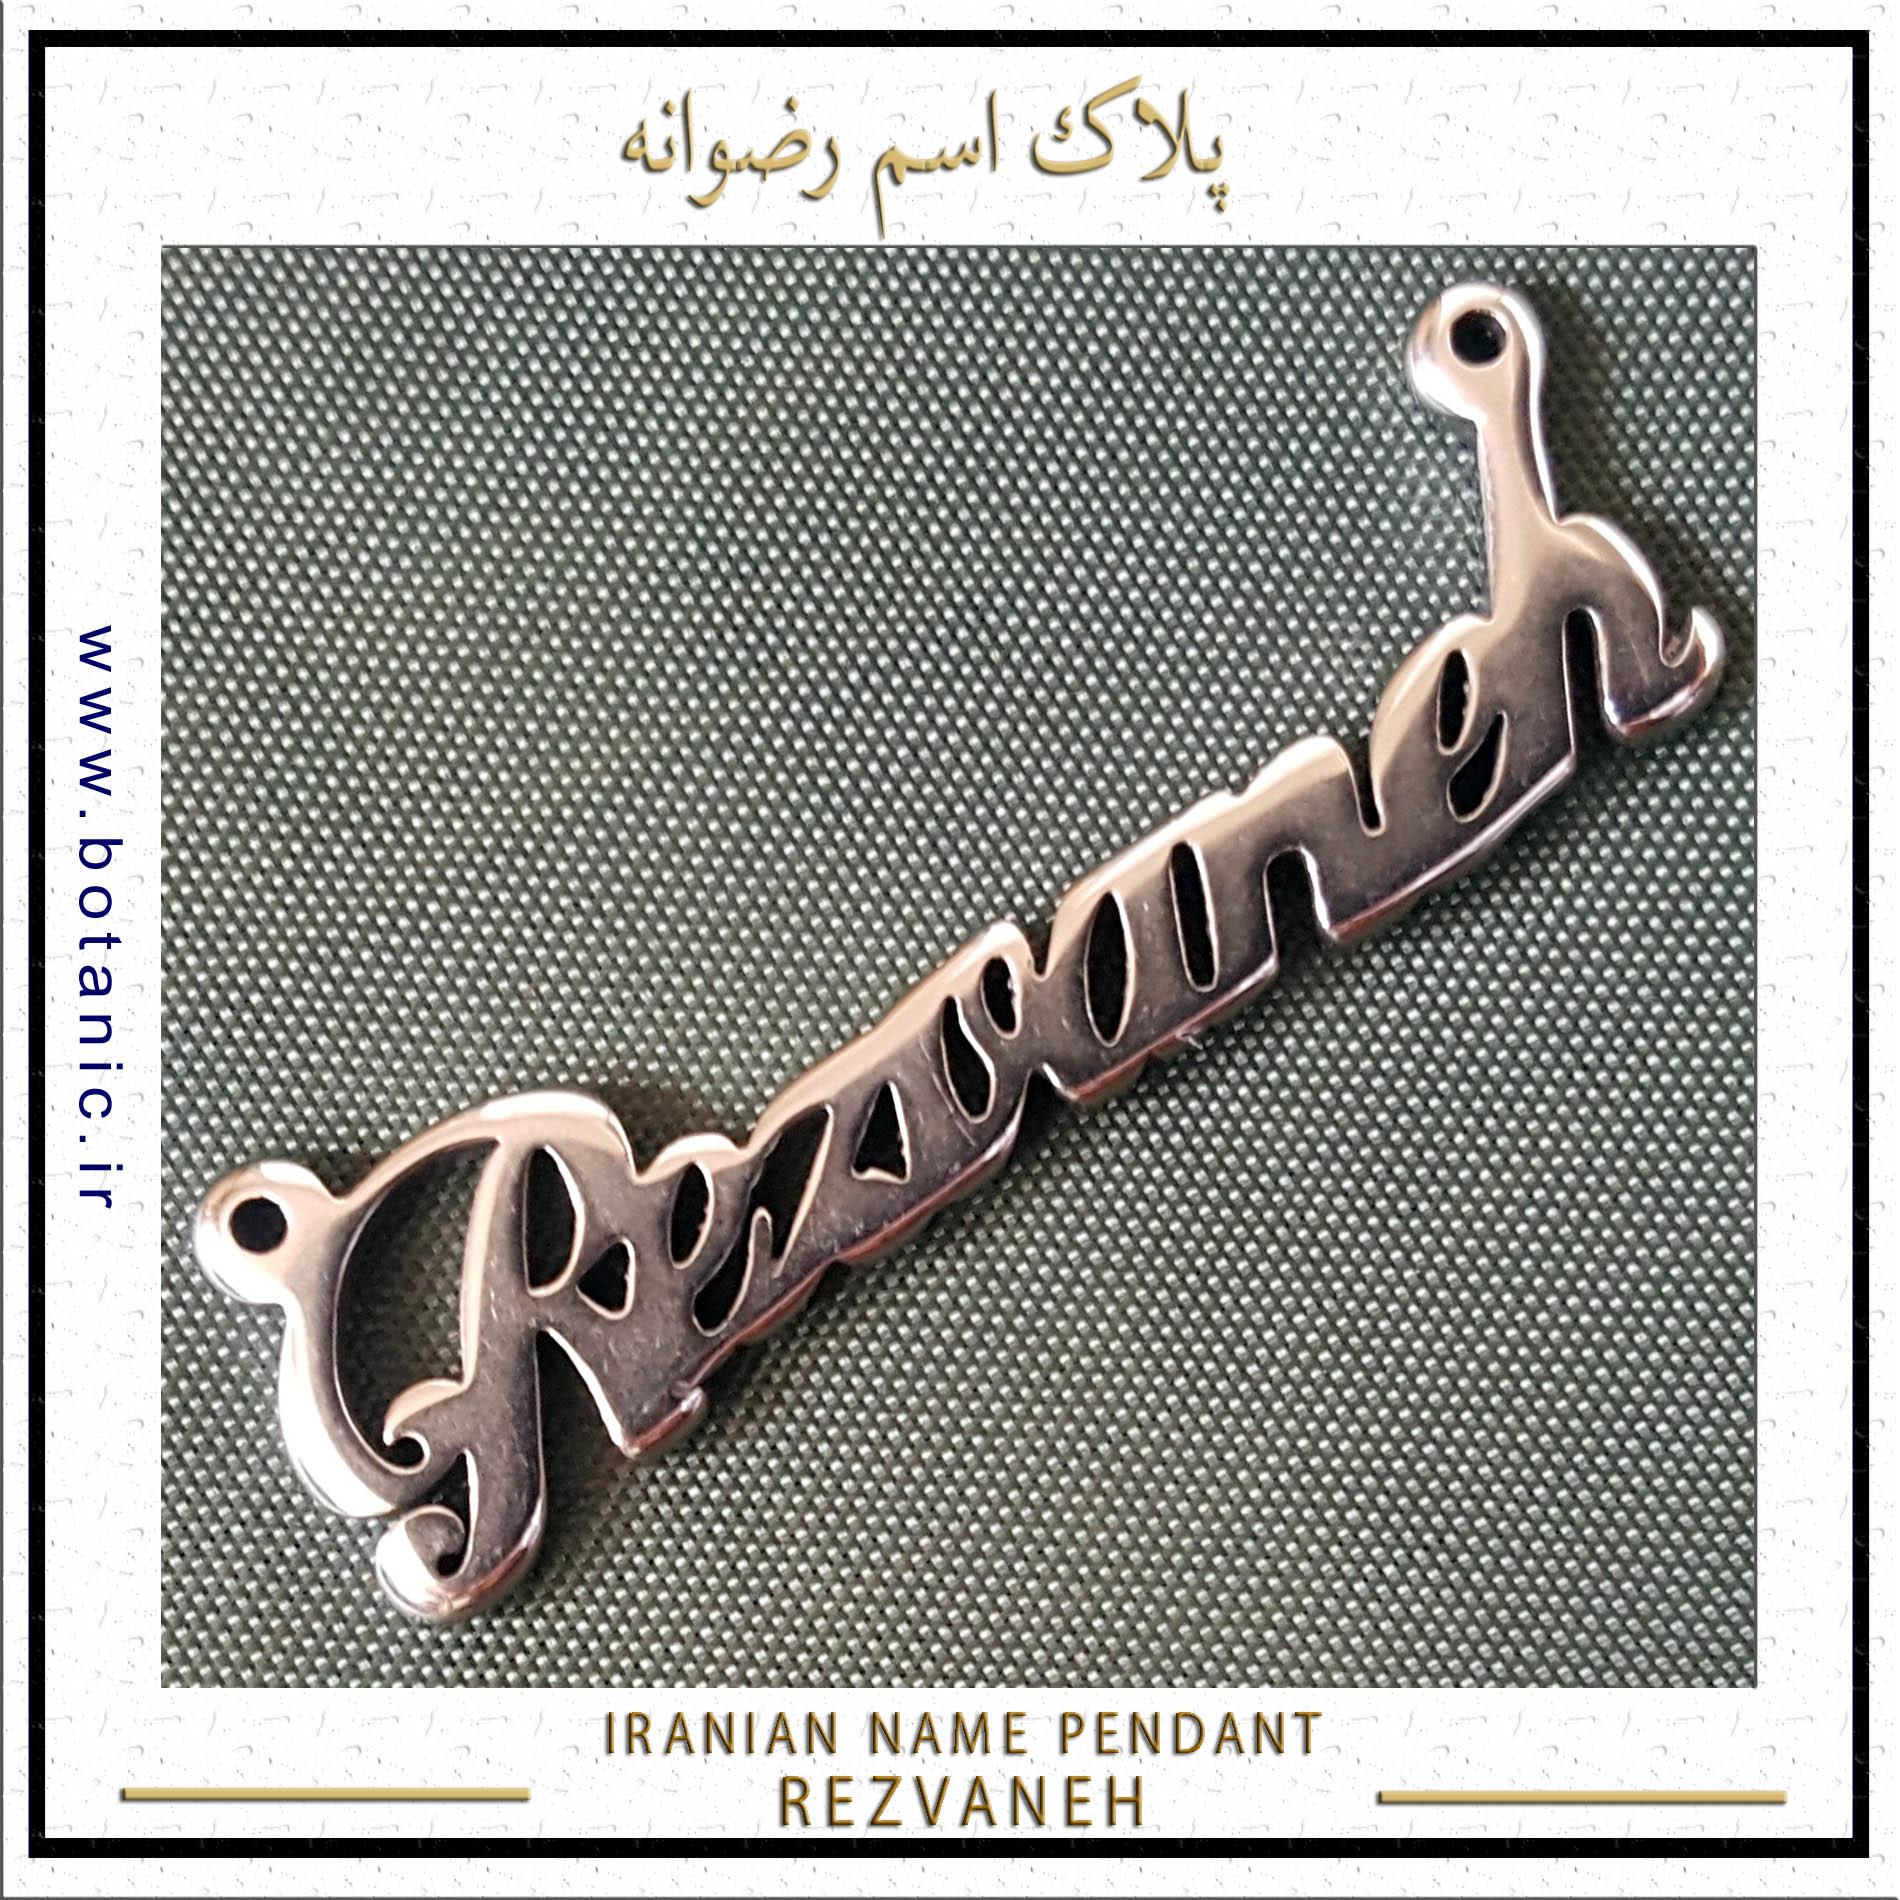 Iranian Name Pendant Rezvaneh